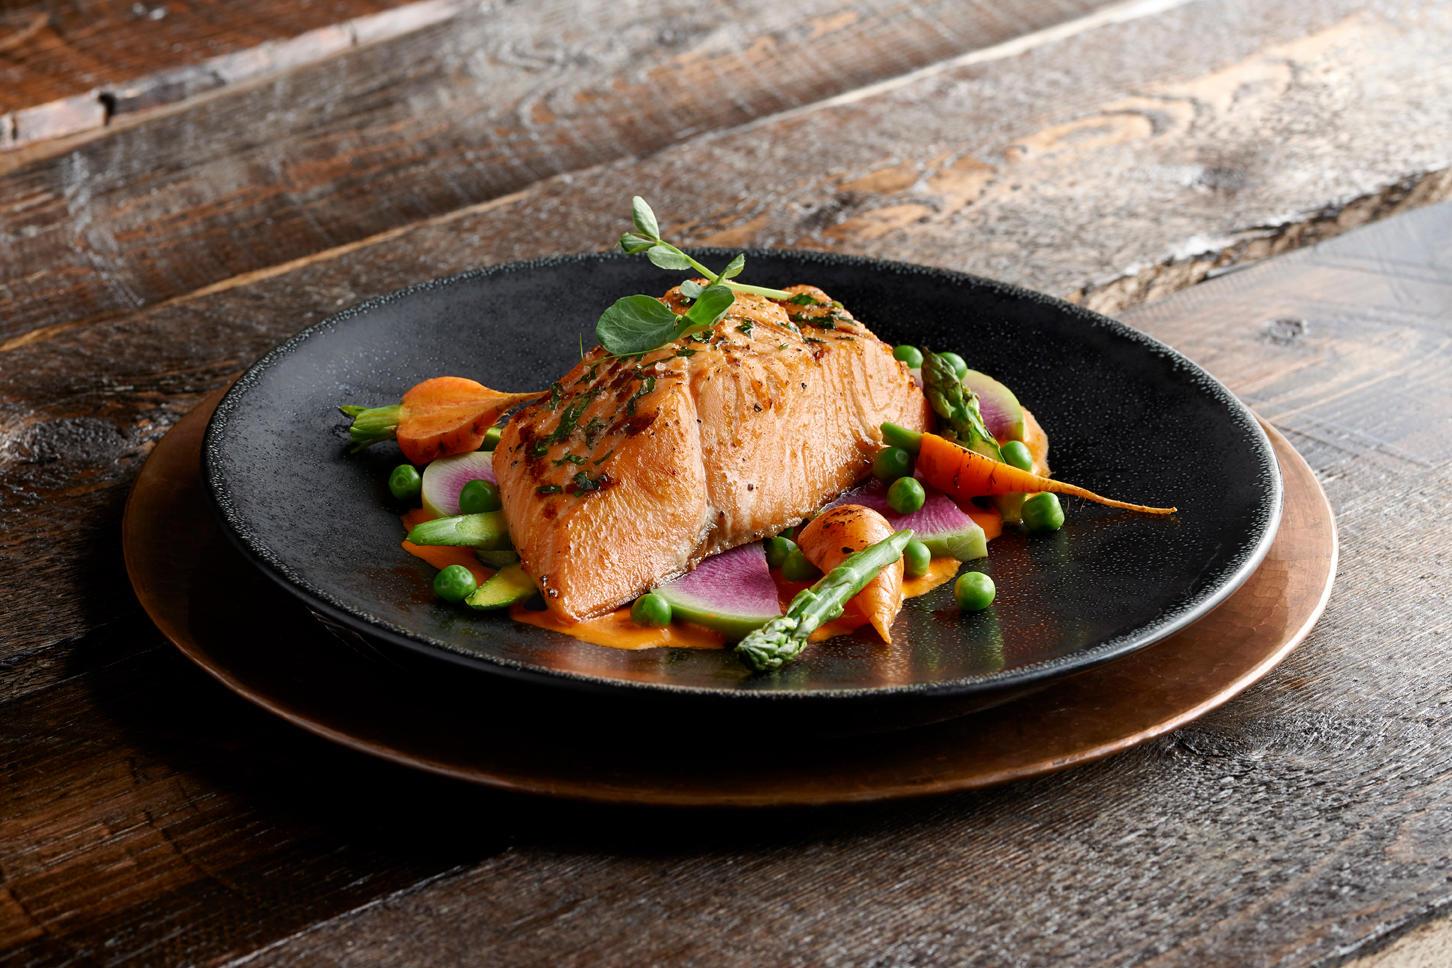 McCormick & Schmick's Seafood & Steaks image 12